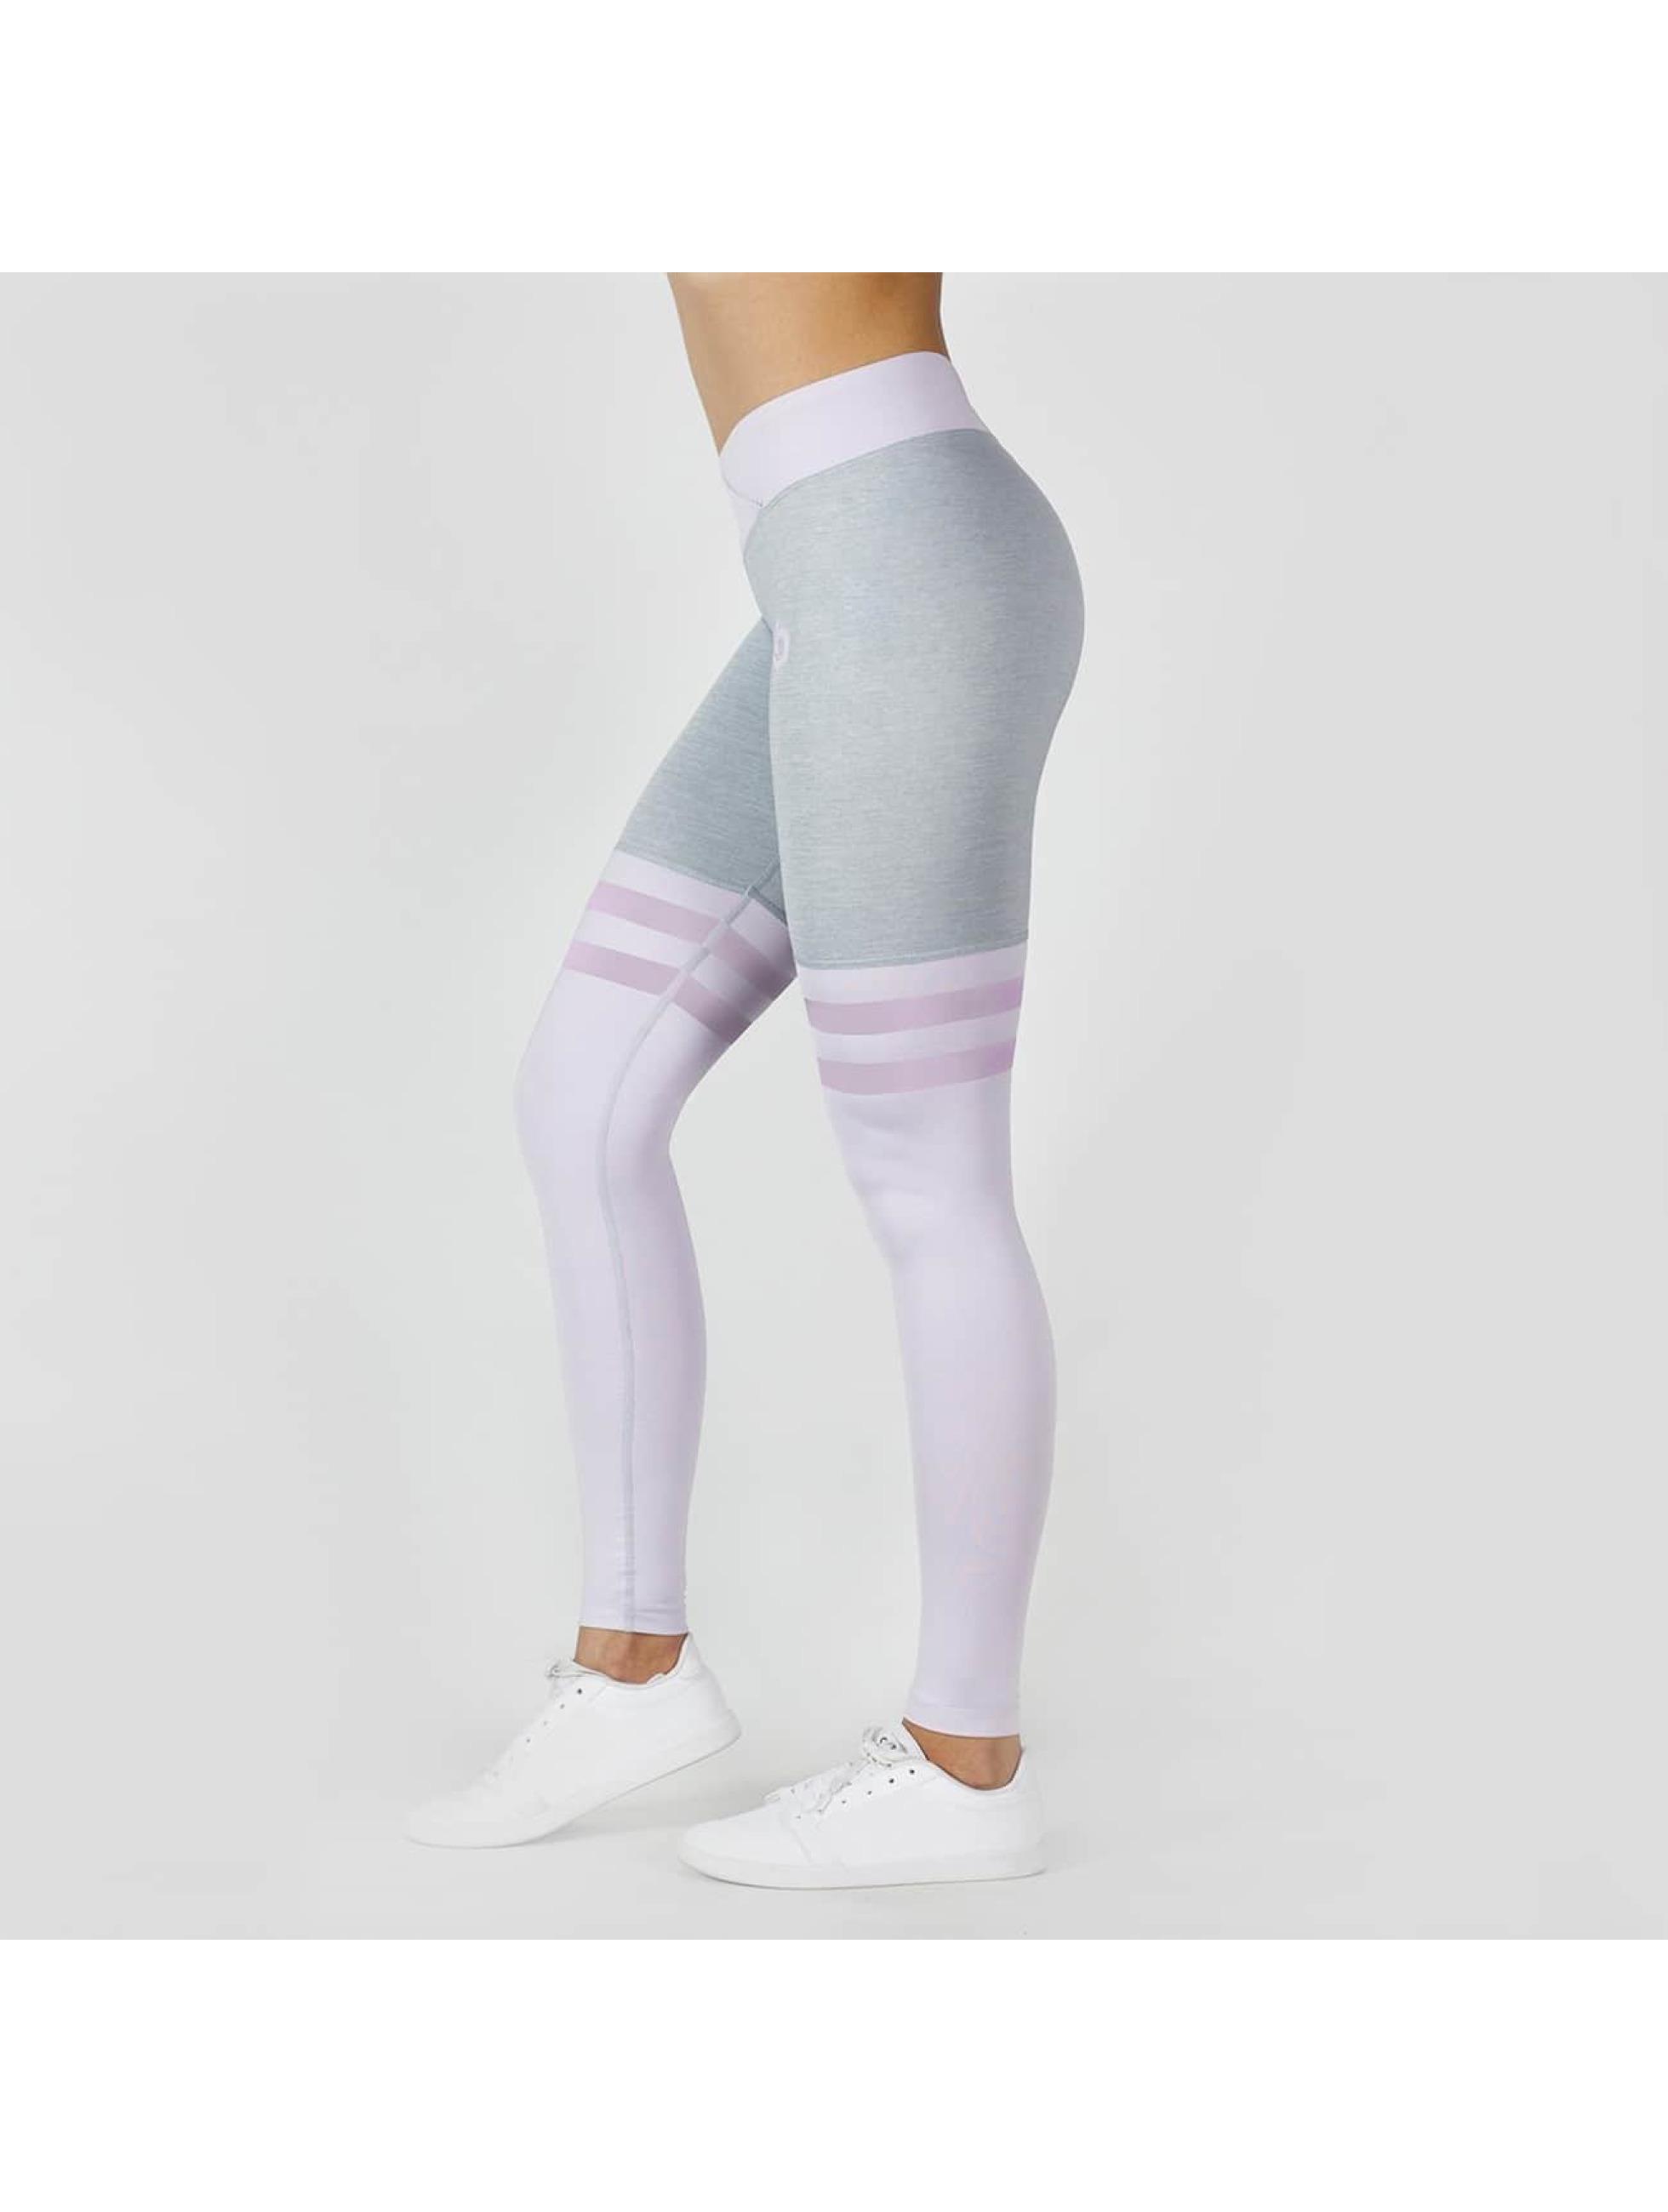 Beyond Limits Legging Overknee gris